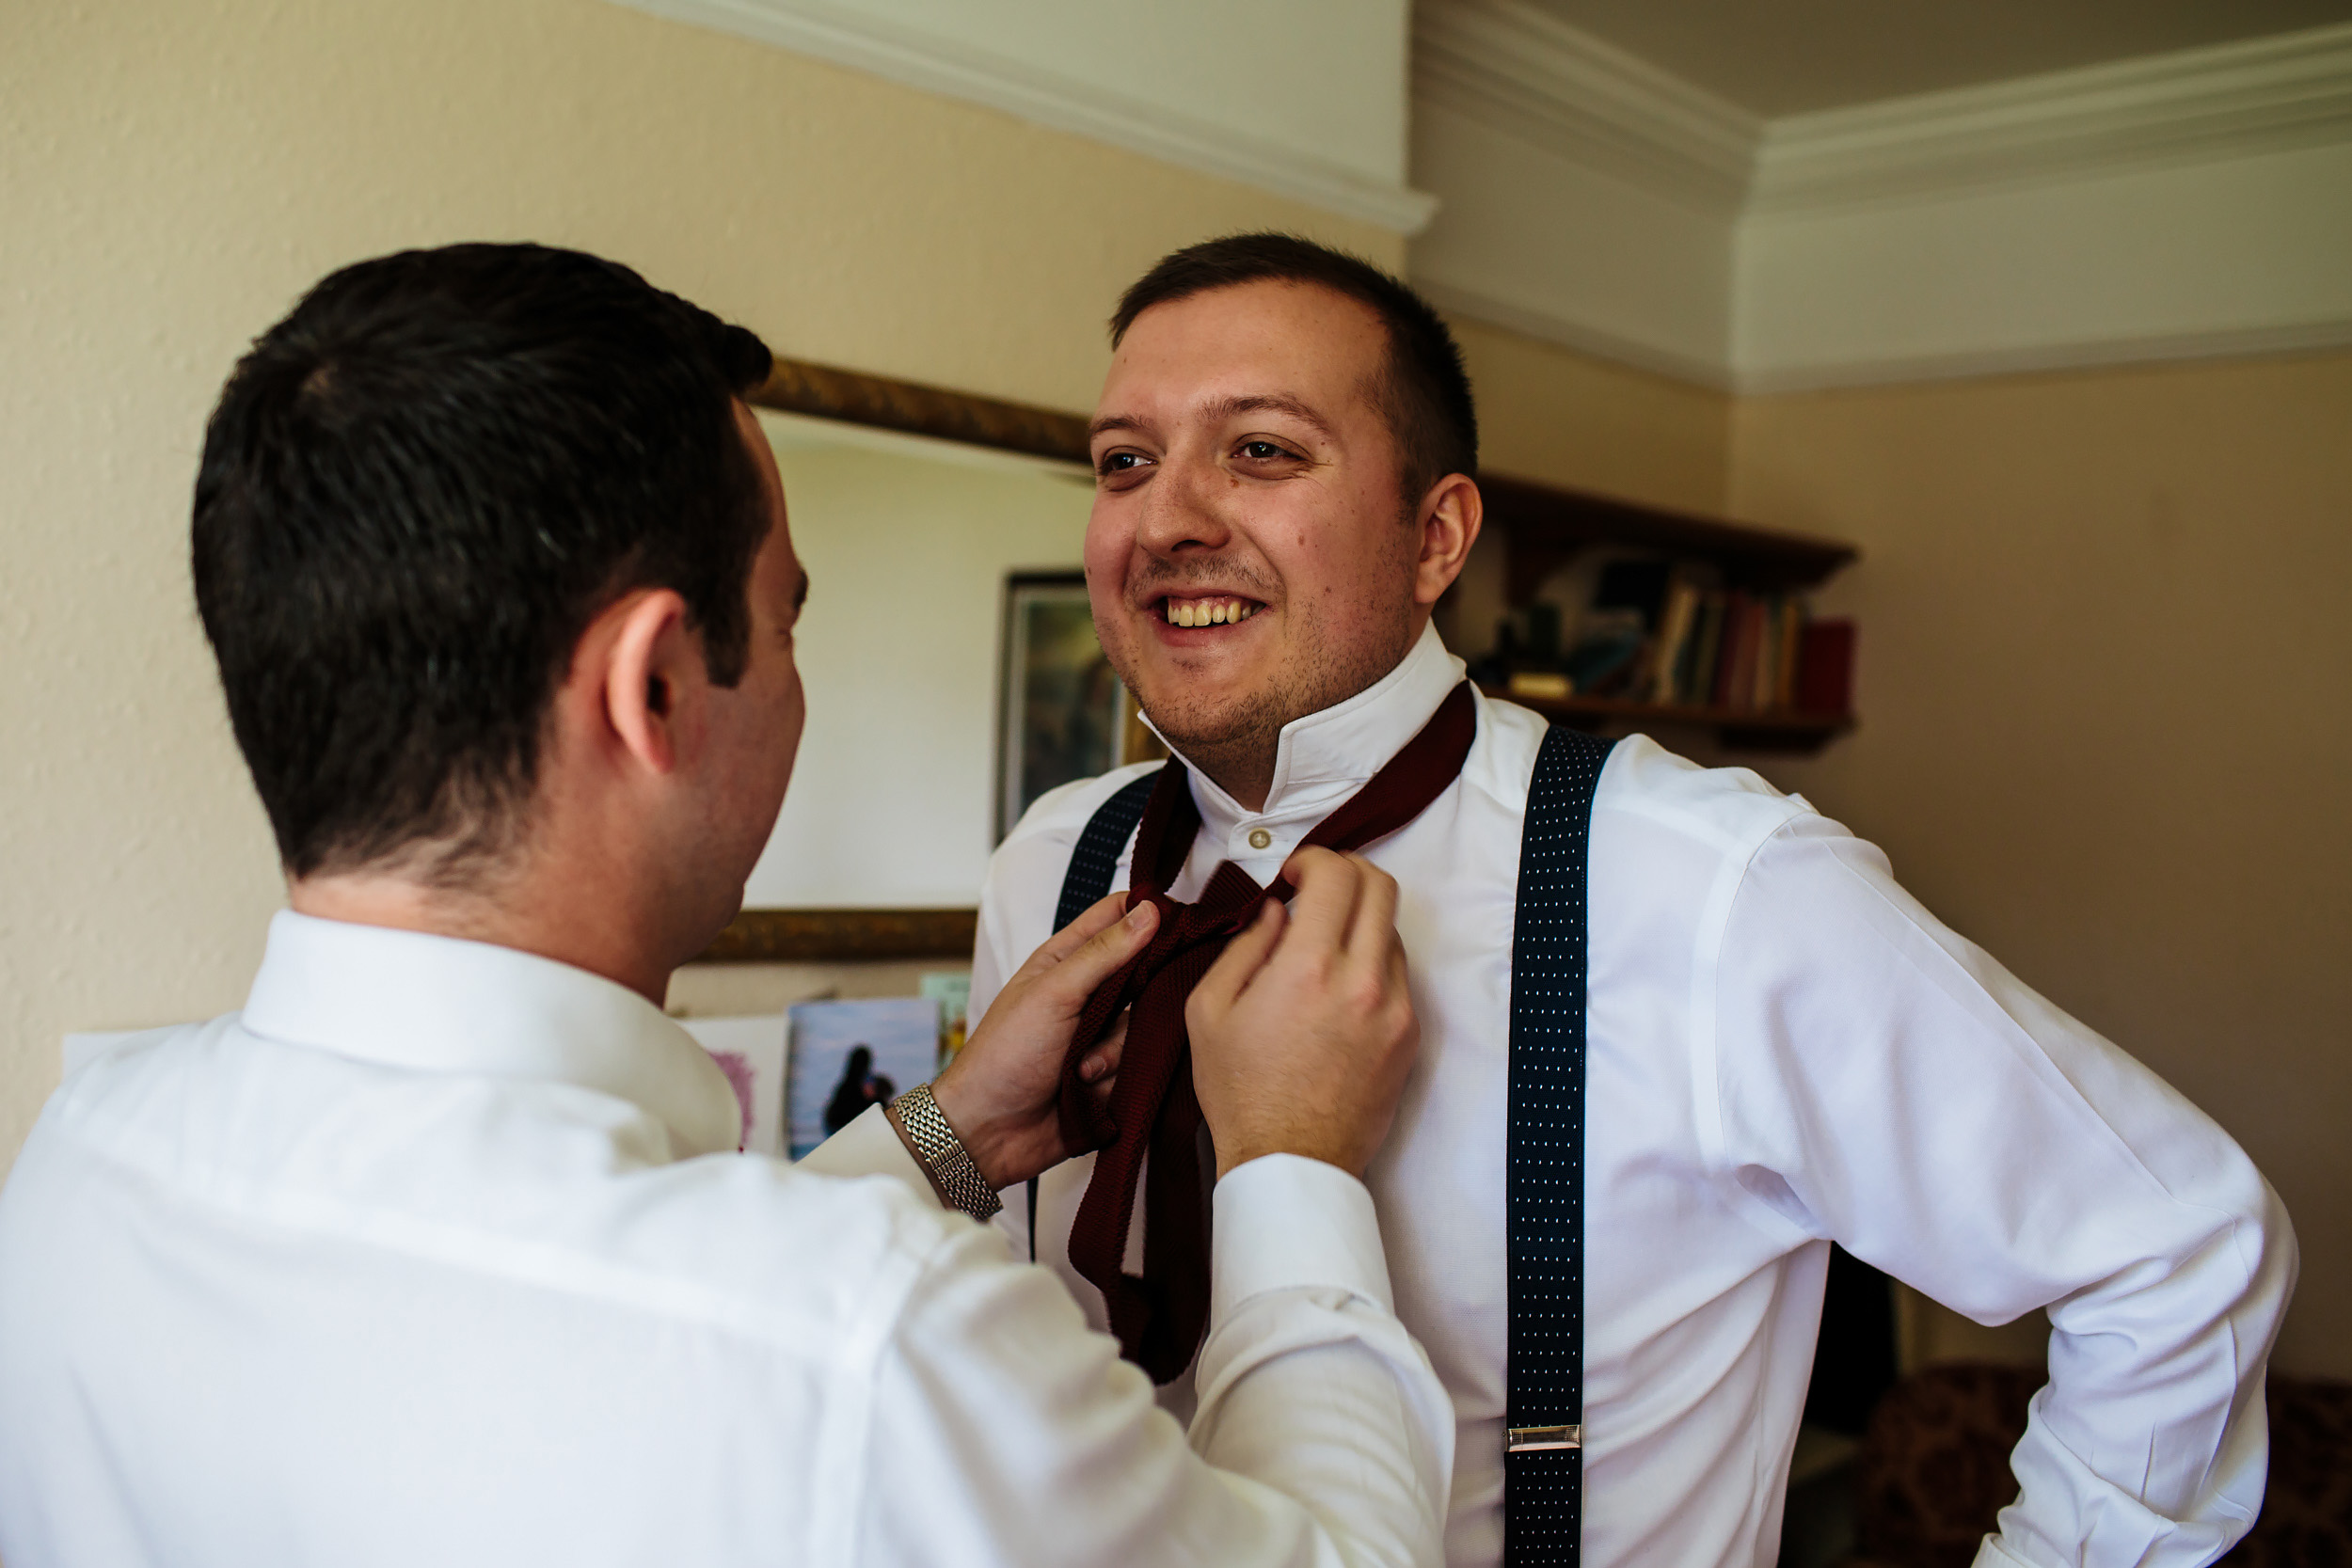 Best man adjusts grooms tie on his wedding day in Lancashire